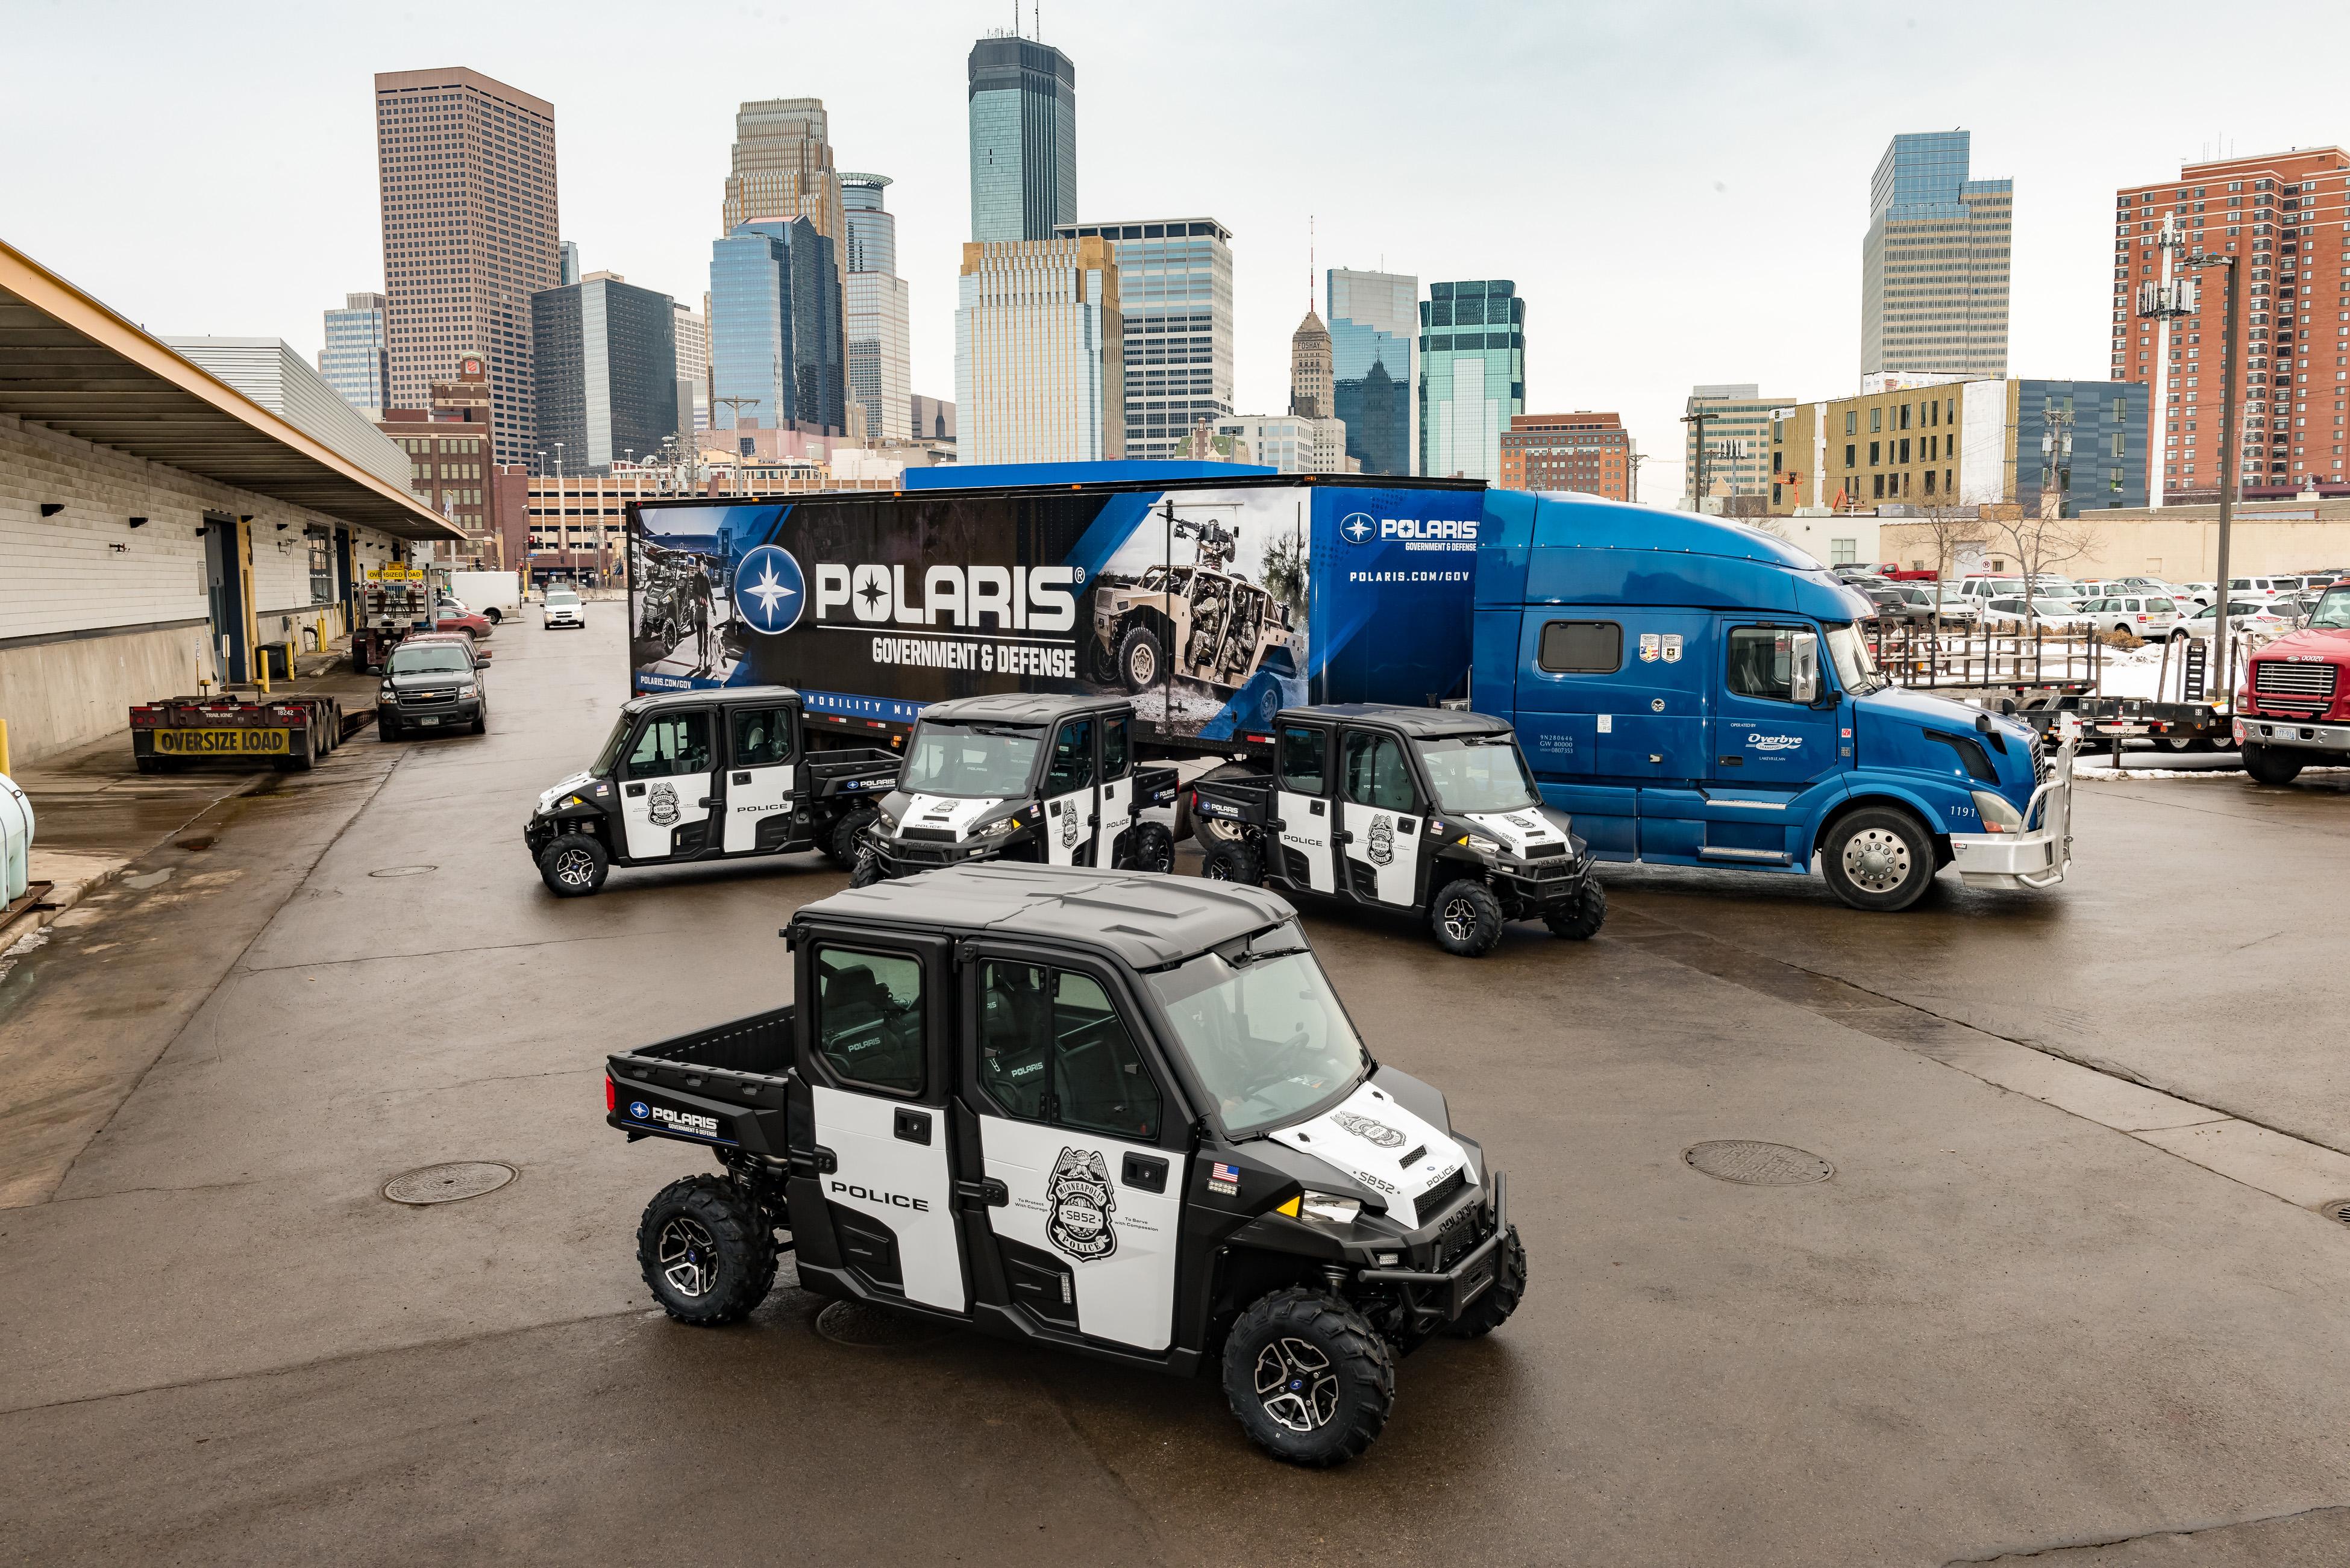 Super Bowl Polaris SB52 Police RANGER